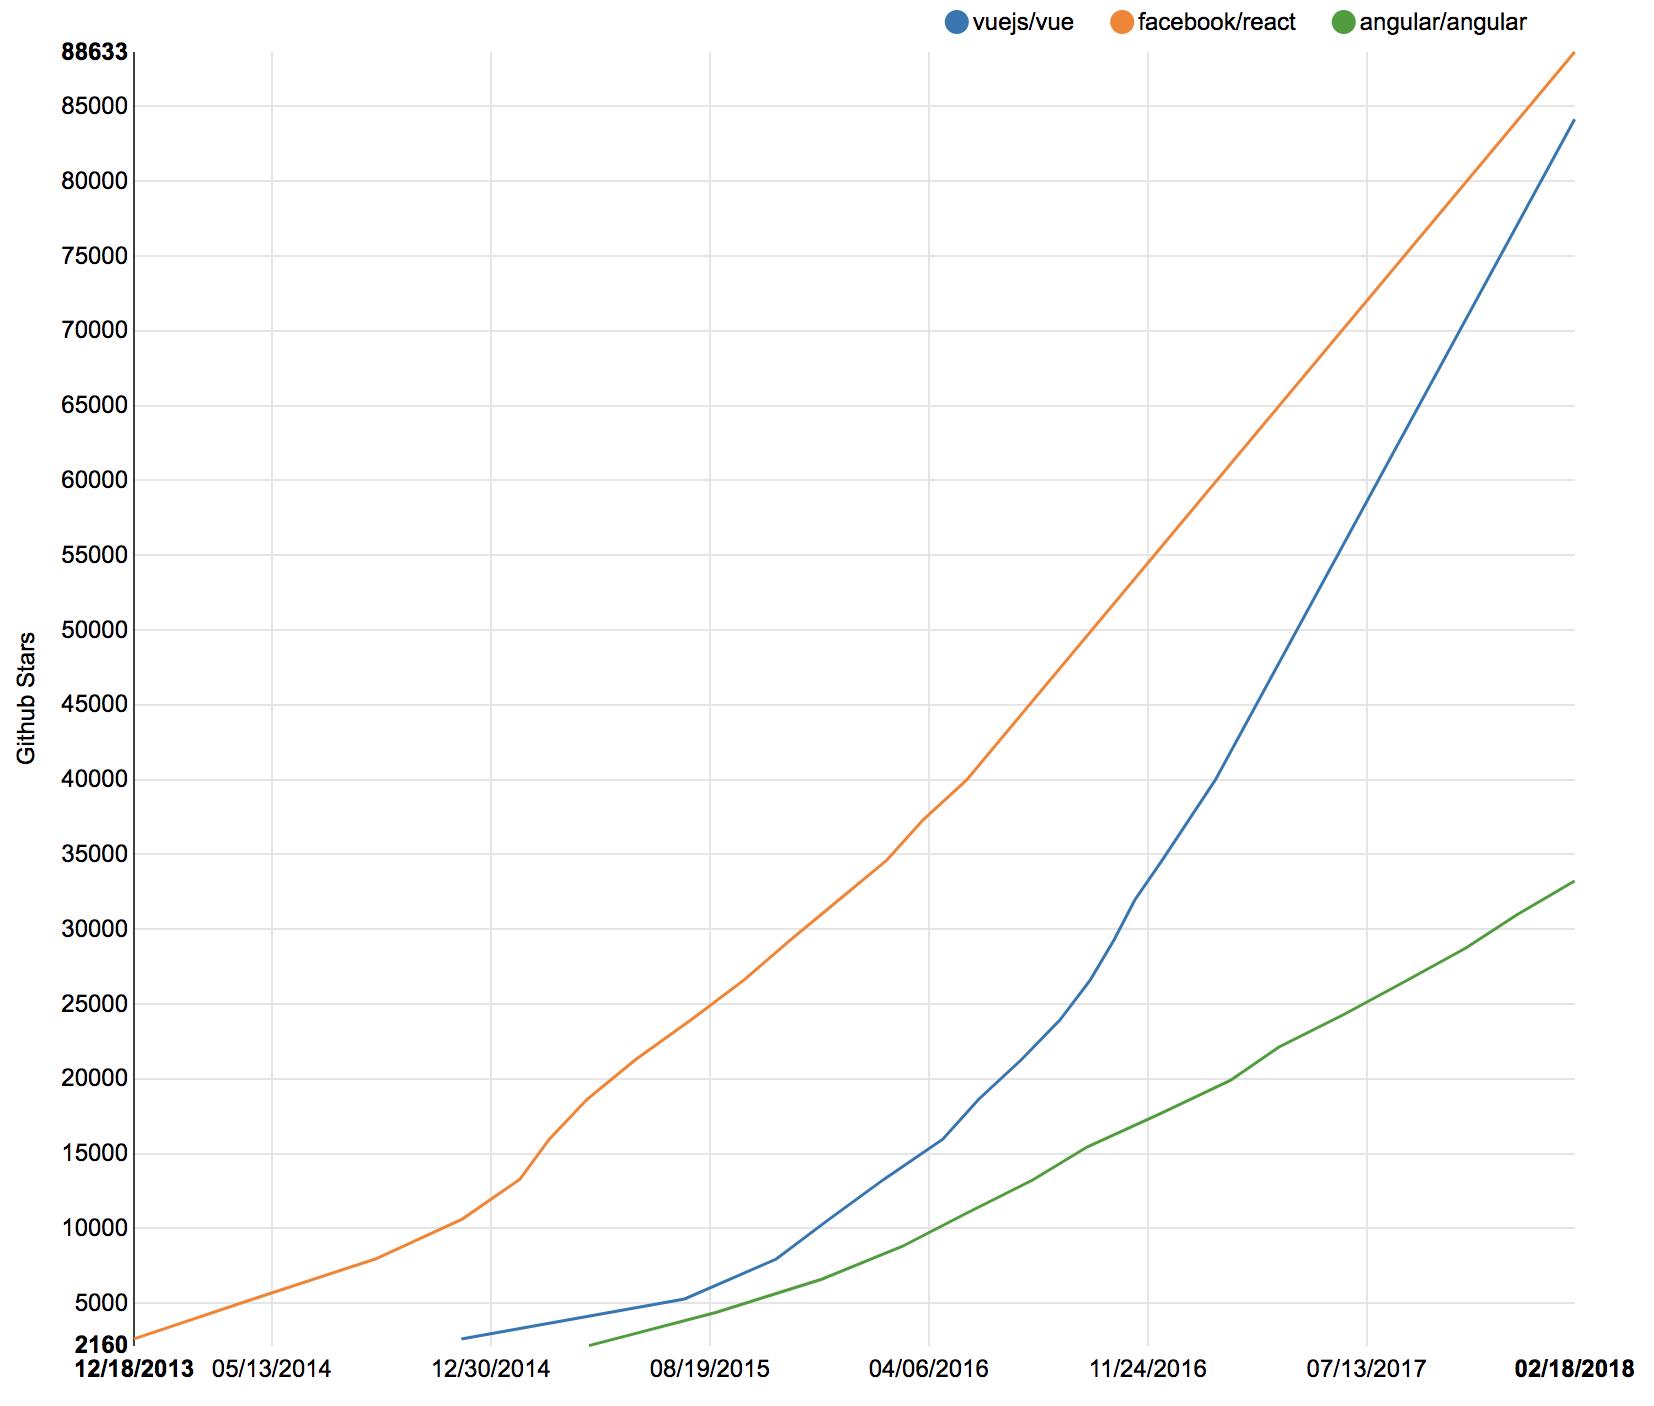 Количество Звезд на гитхабе - Vue vs React Vs Angular